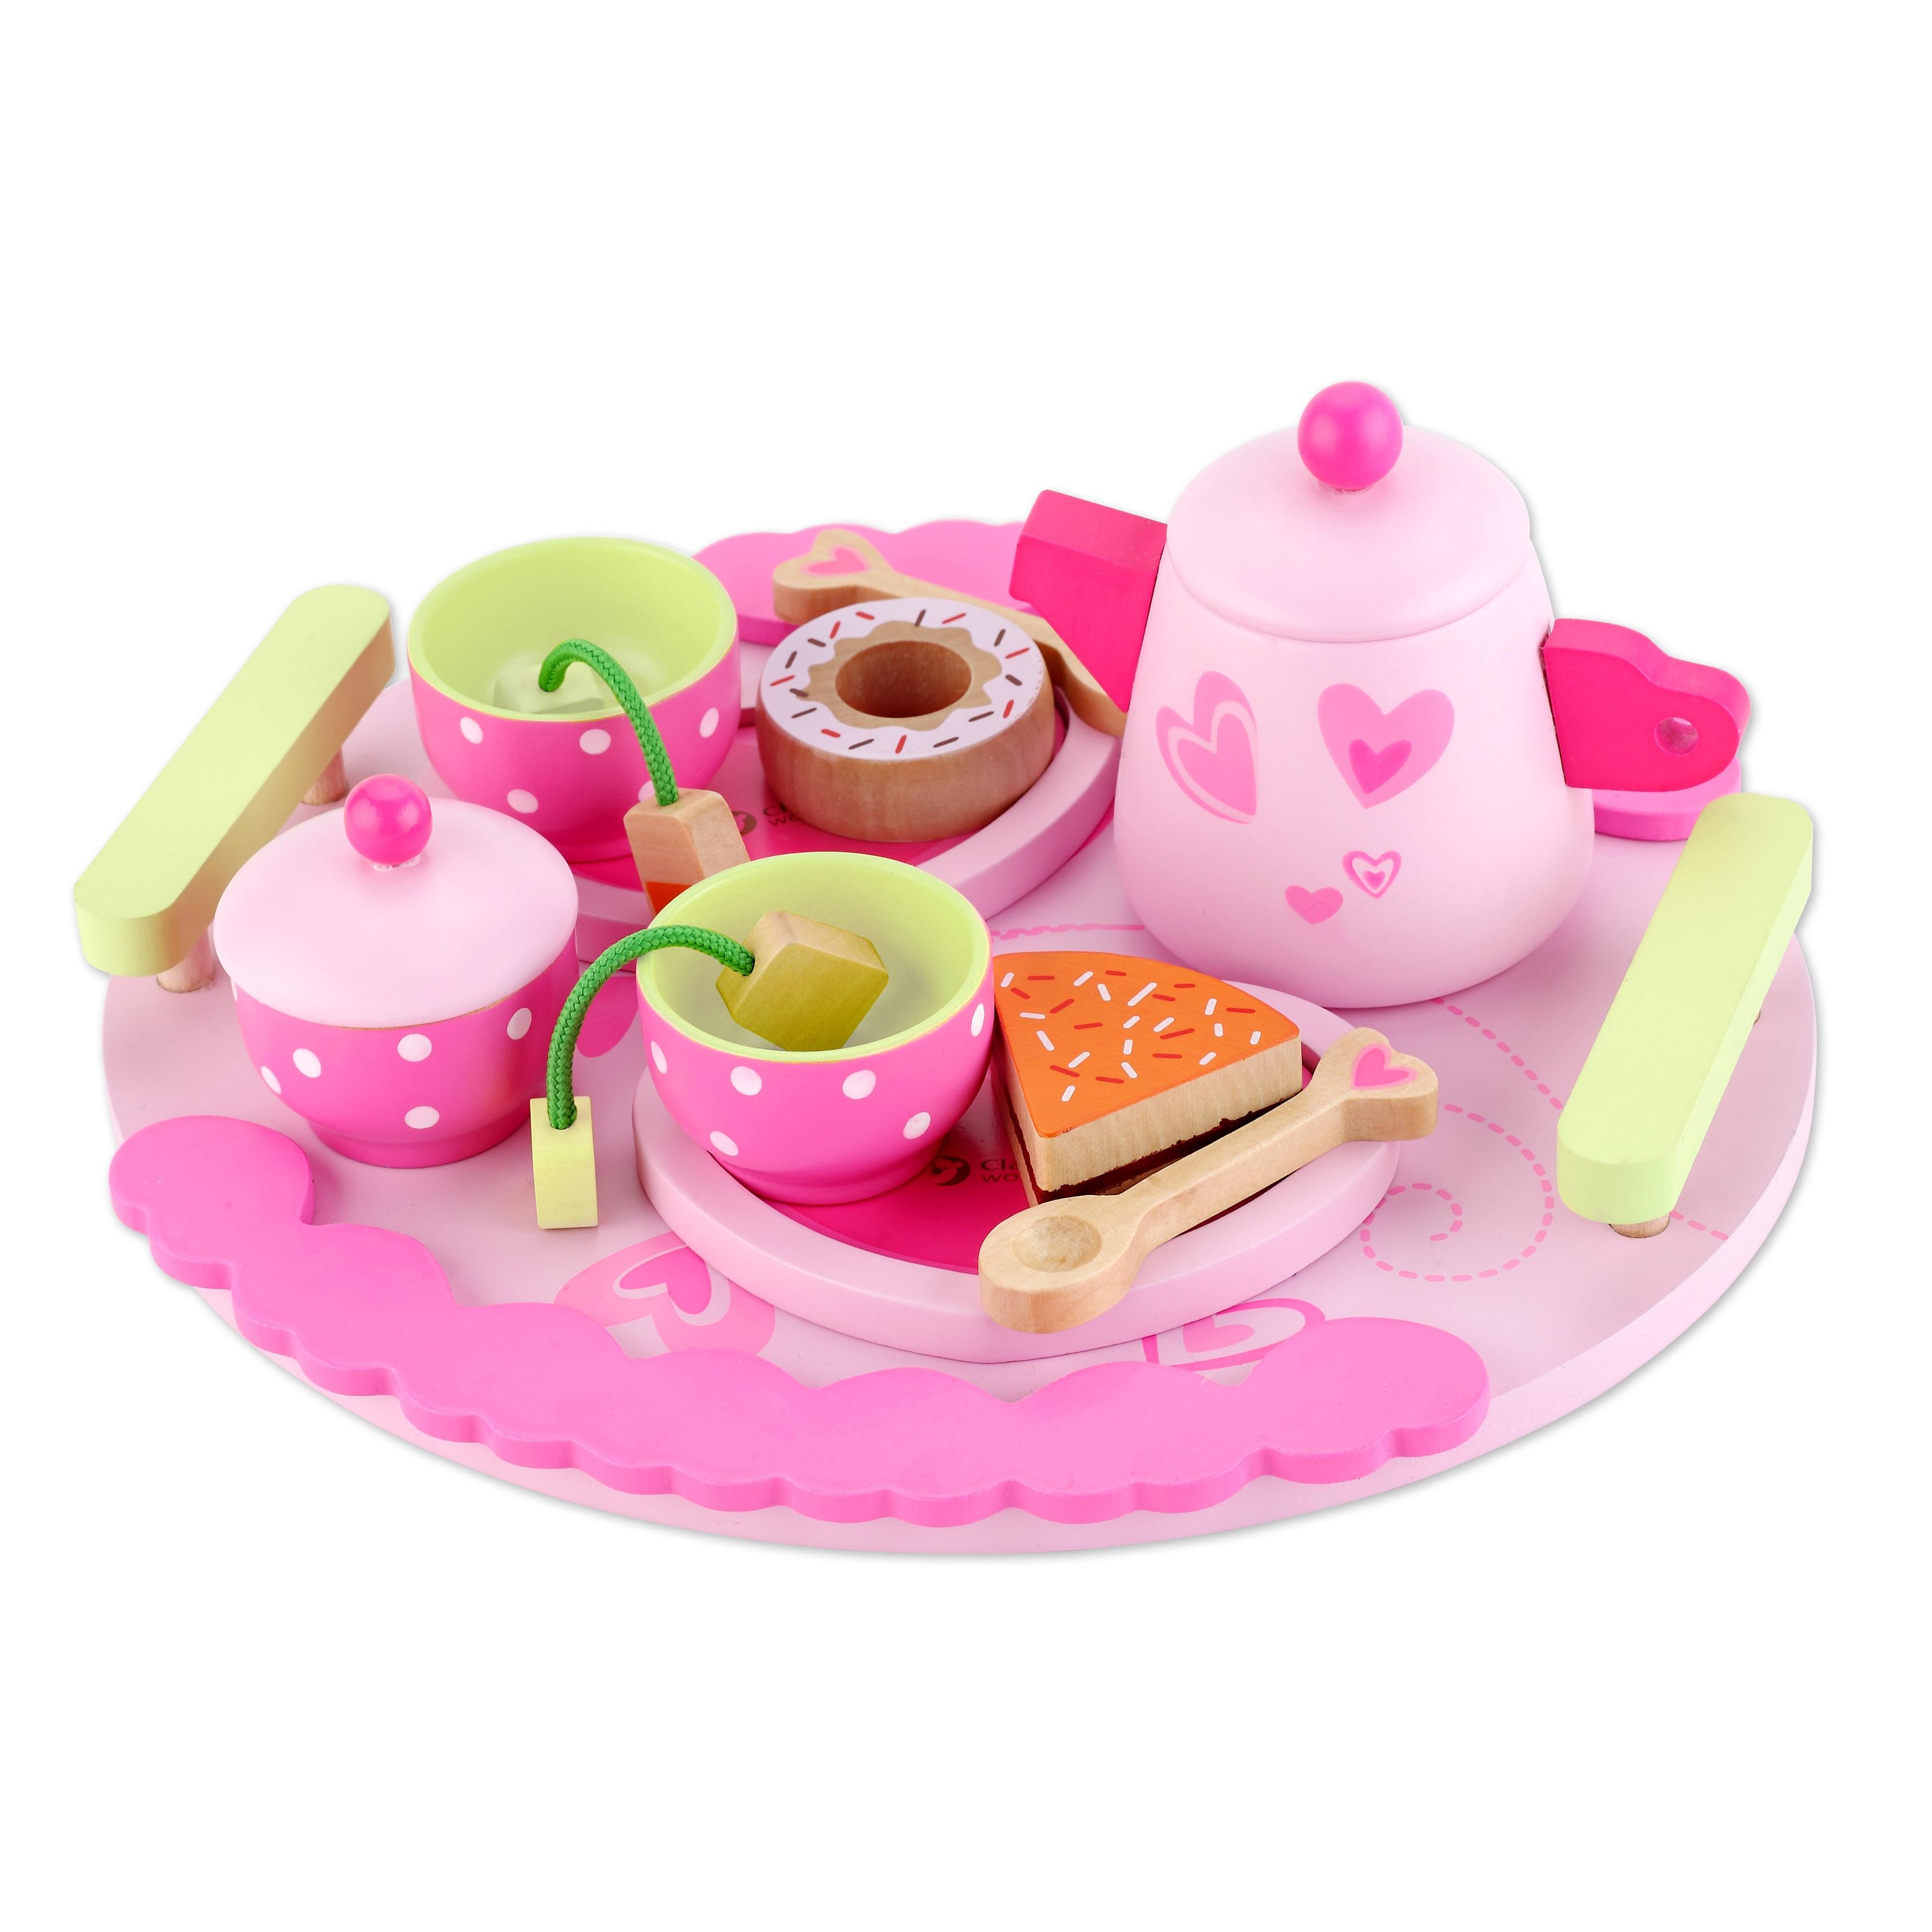 Classic World Afternoon Tea Set, Pink